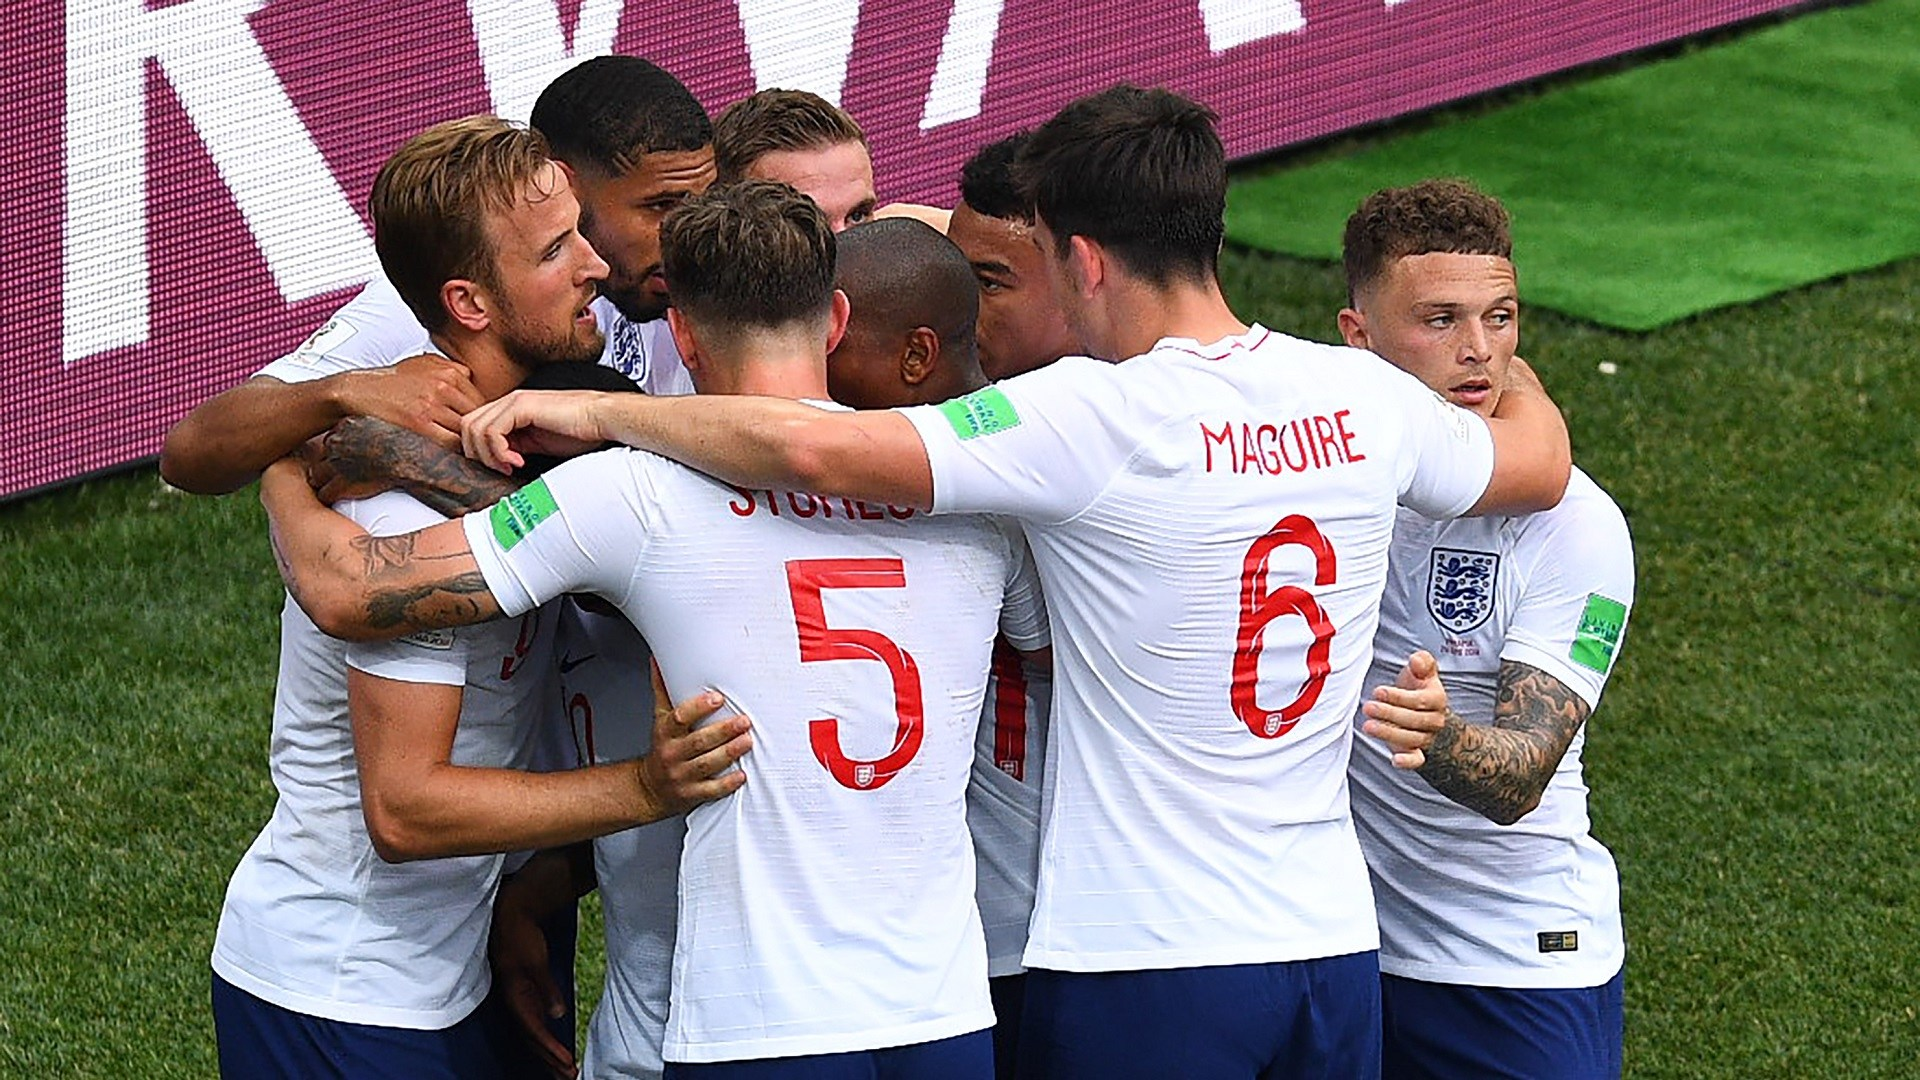 England World Cup team